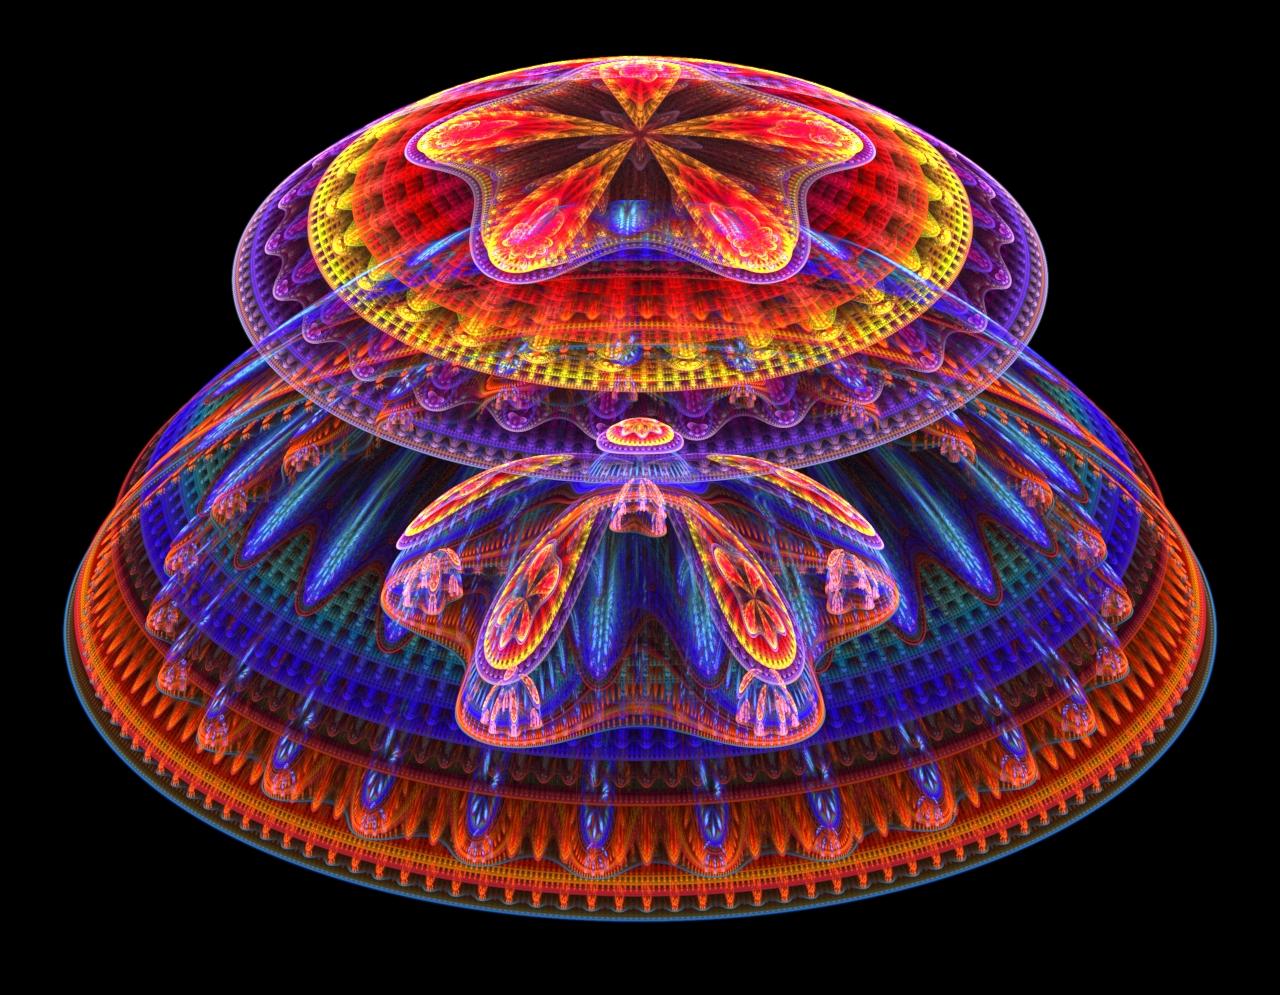 Trippy Mushroom Wallpaper HD wallpaper background 1280x995